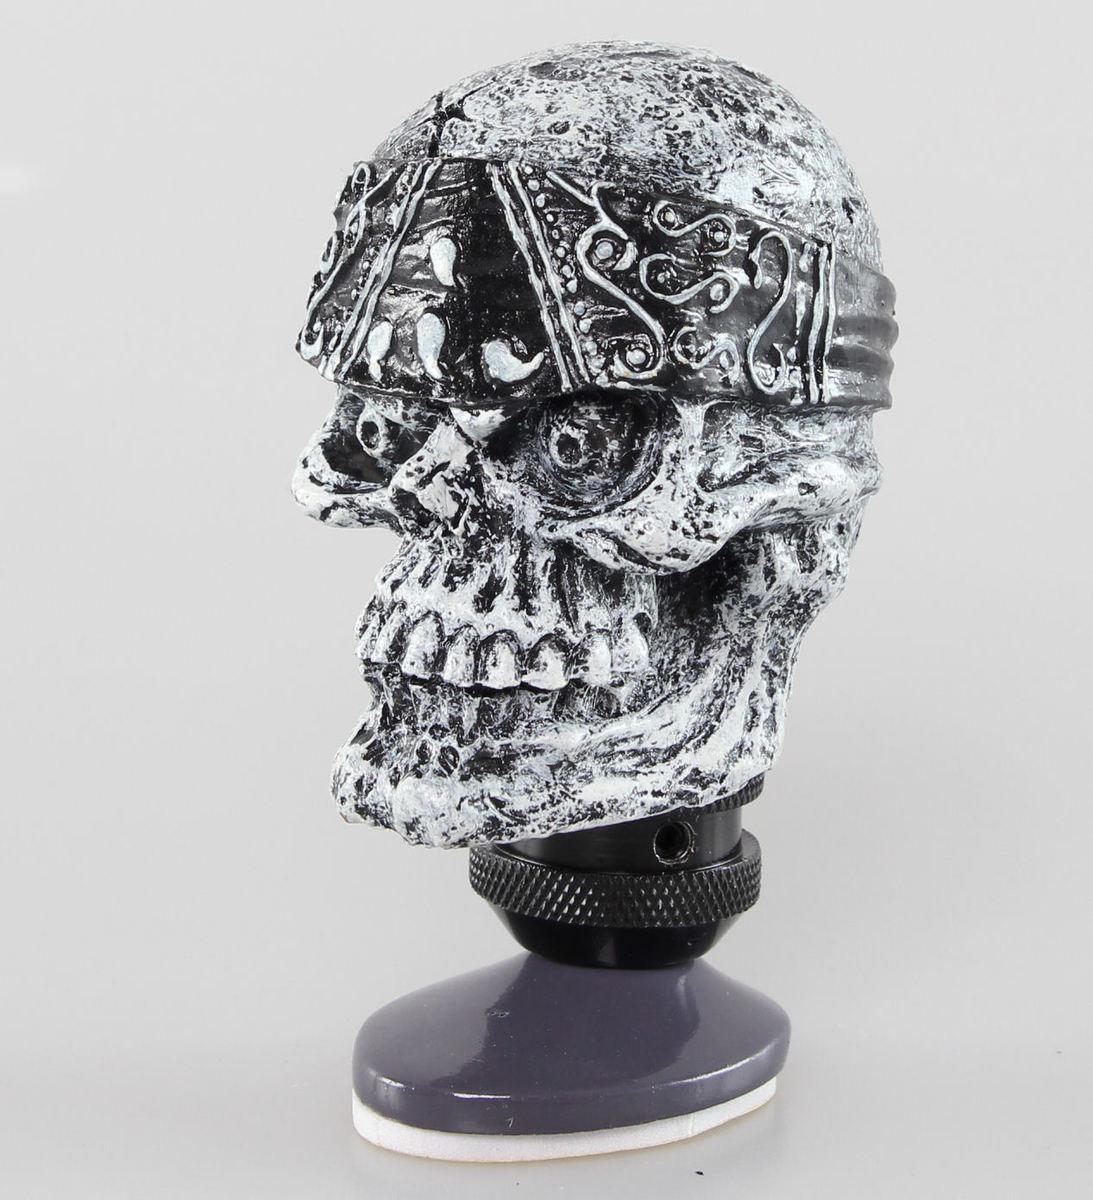 dekorace (hlavice řadící páky) LETHAL THREAT - Skull Head Shift Knob - SK00020